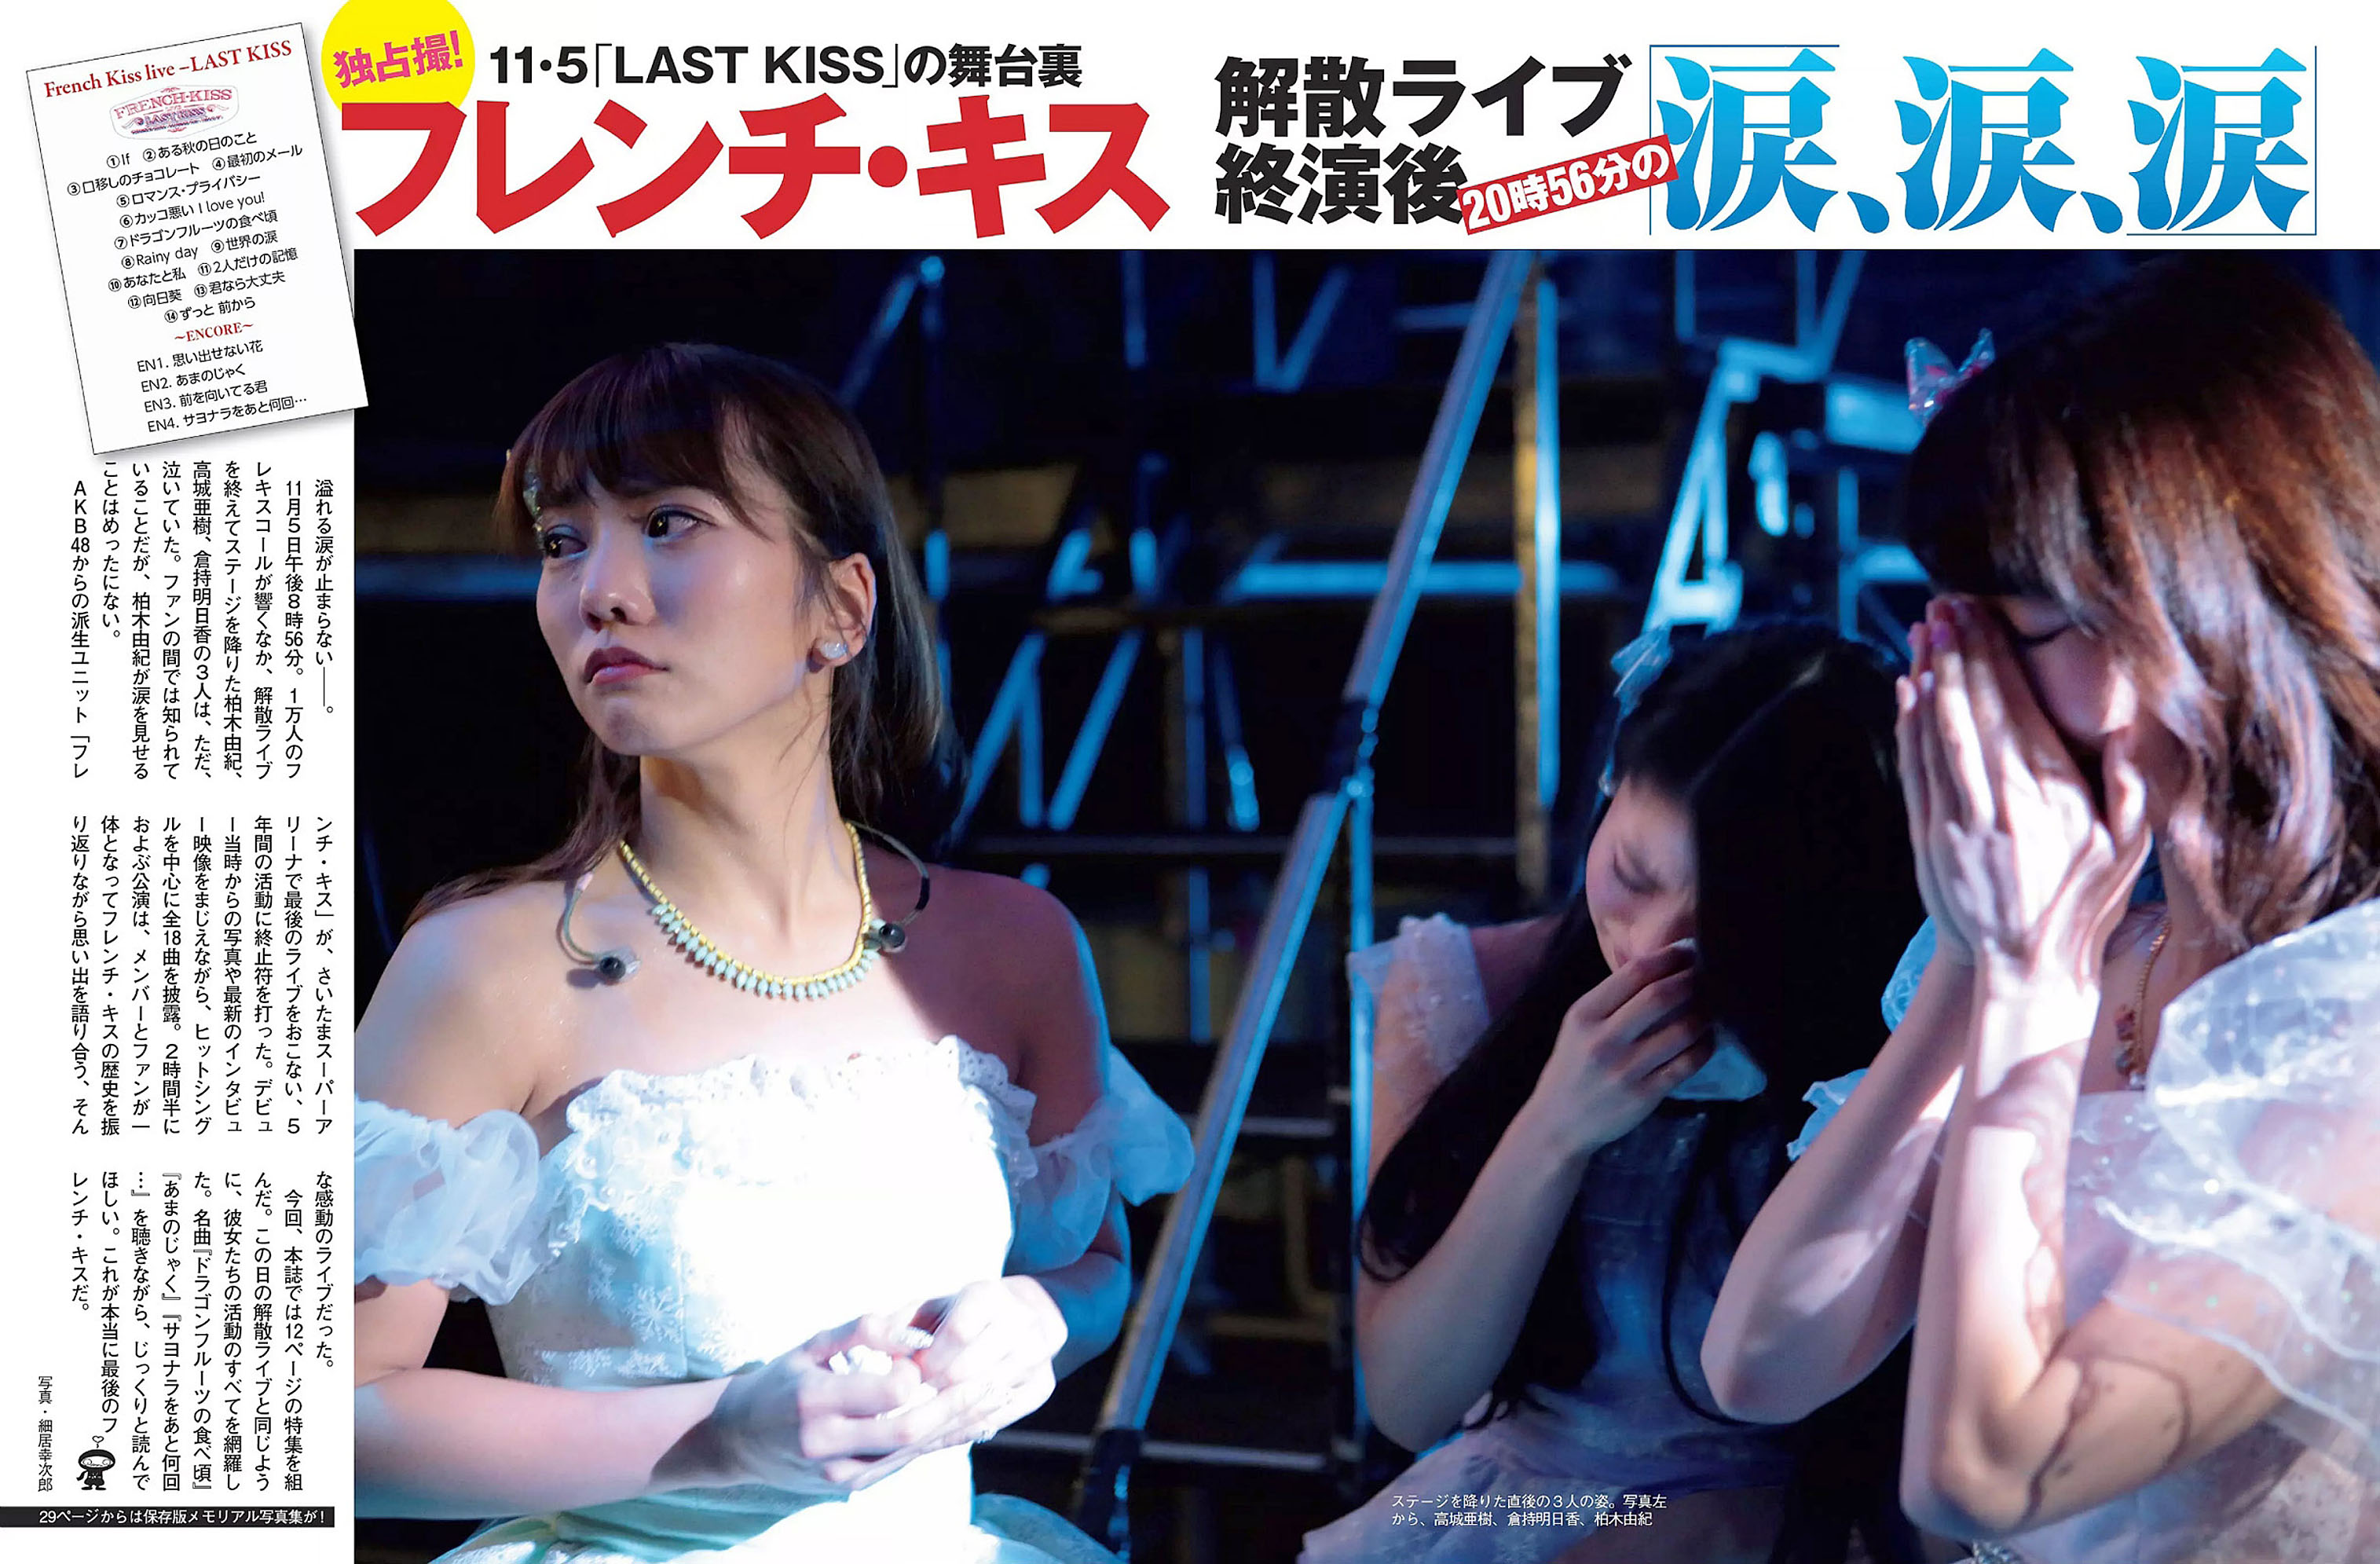 AKB48 French Kiss Flash 151124 01.jpg